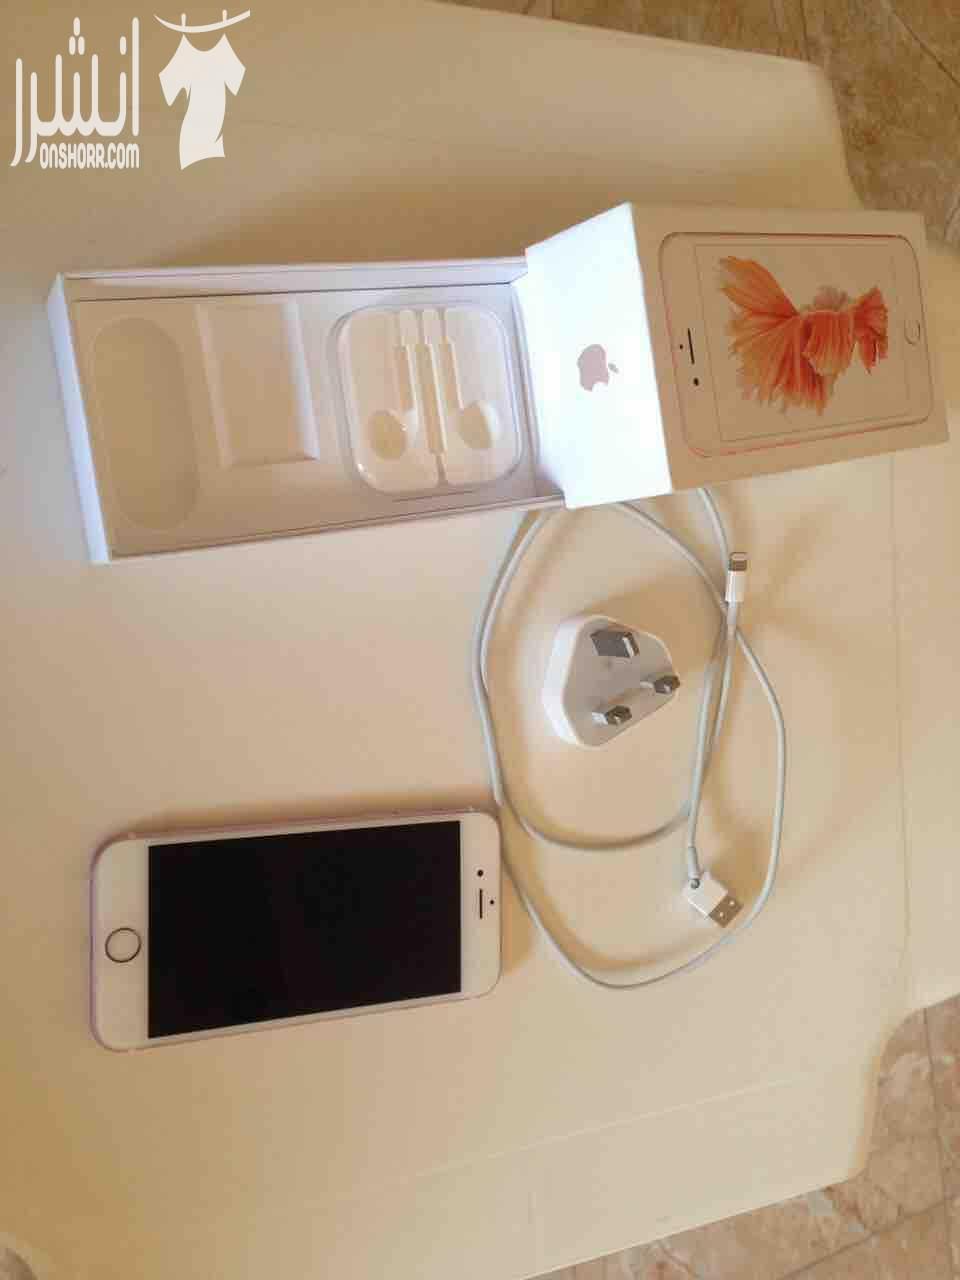 iPhone 11 64GB - $ 650 USDiPhone 11 128GB - $ 710 USDiPhone 11 256GB - $ 770 USDiPhone 11 Pro 64GB - $ 720 USDiPhone 11 Pro 256GB - $ 750 USDiPhone 11 Pro 512GB-  iPhone 6s rose gold 64Gb...